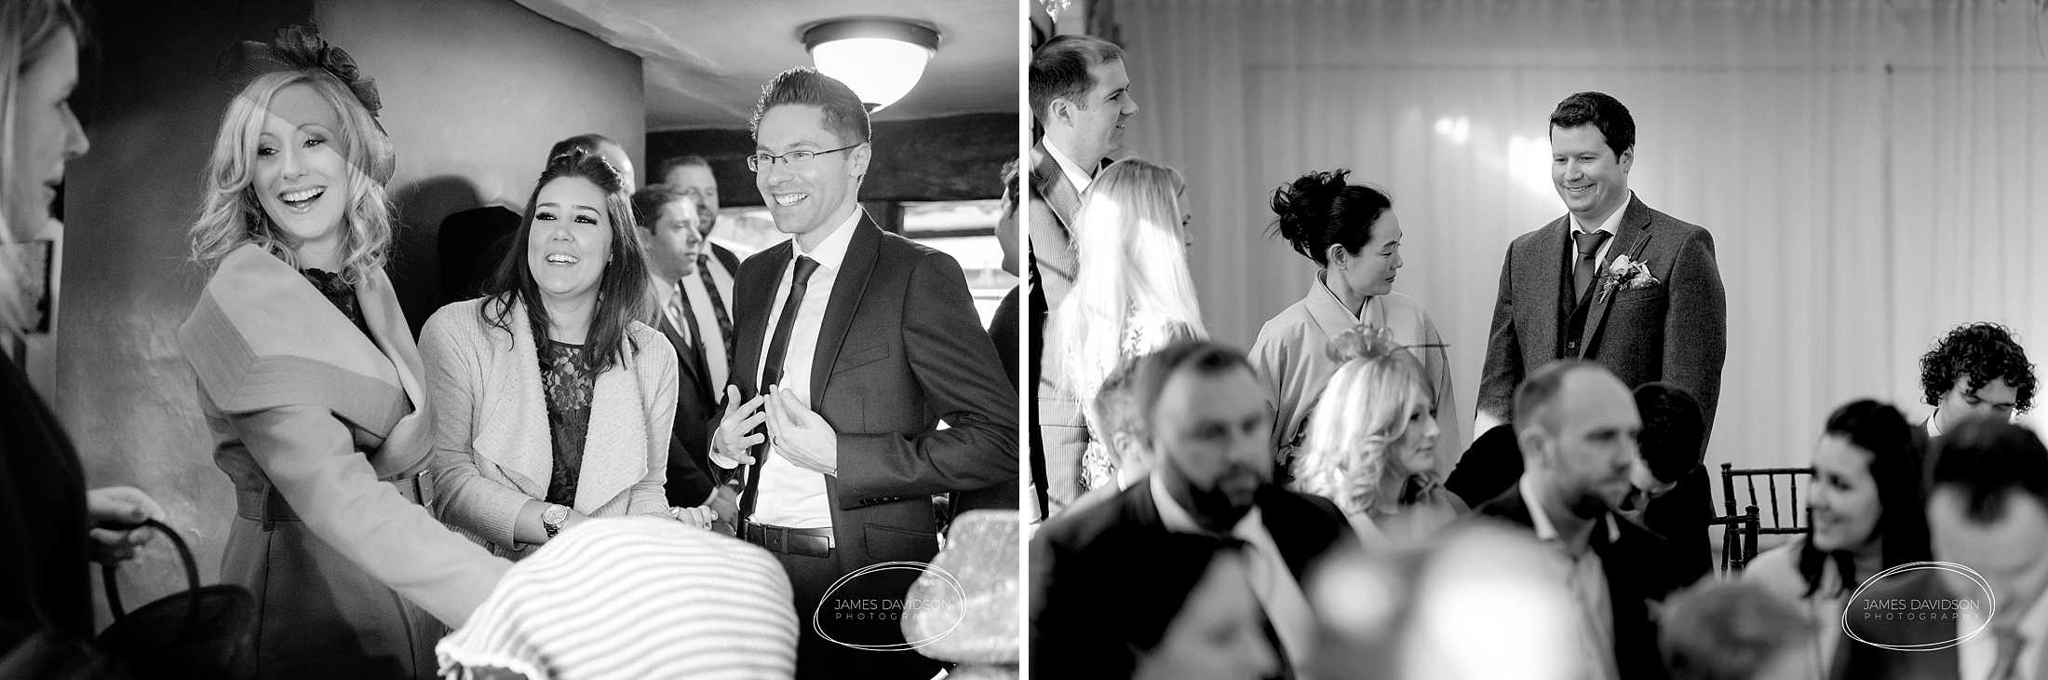 seckford-hall-wedding-026